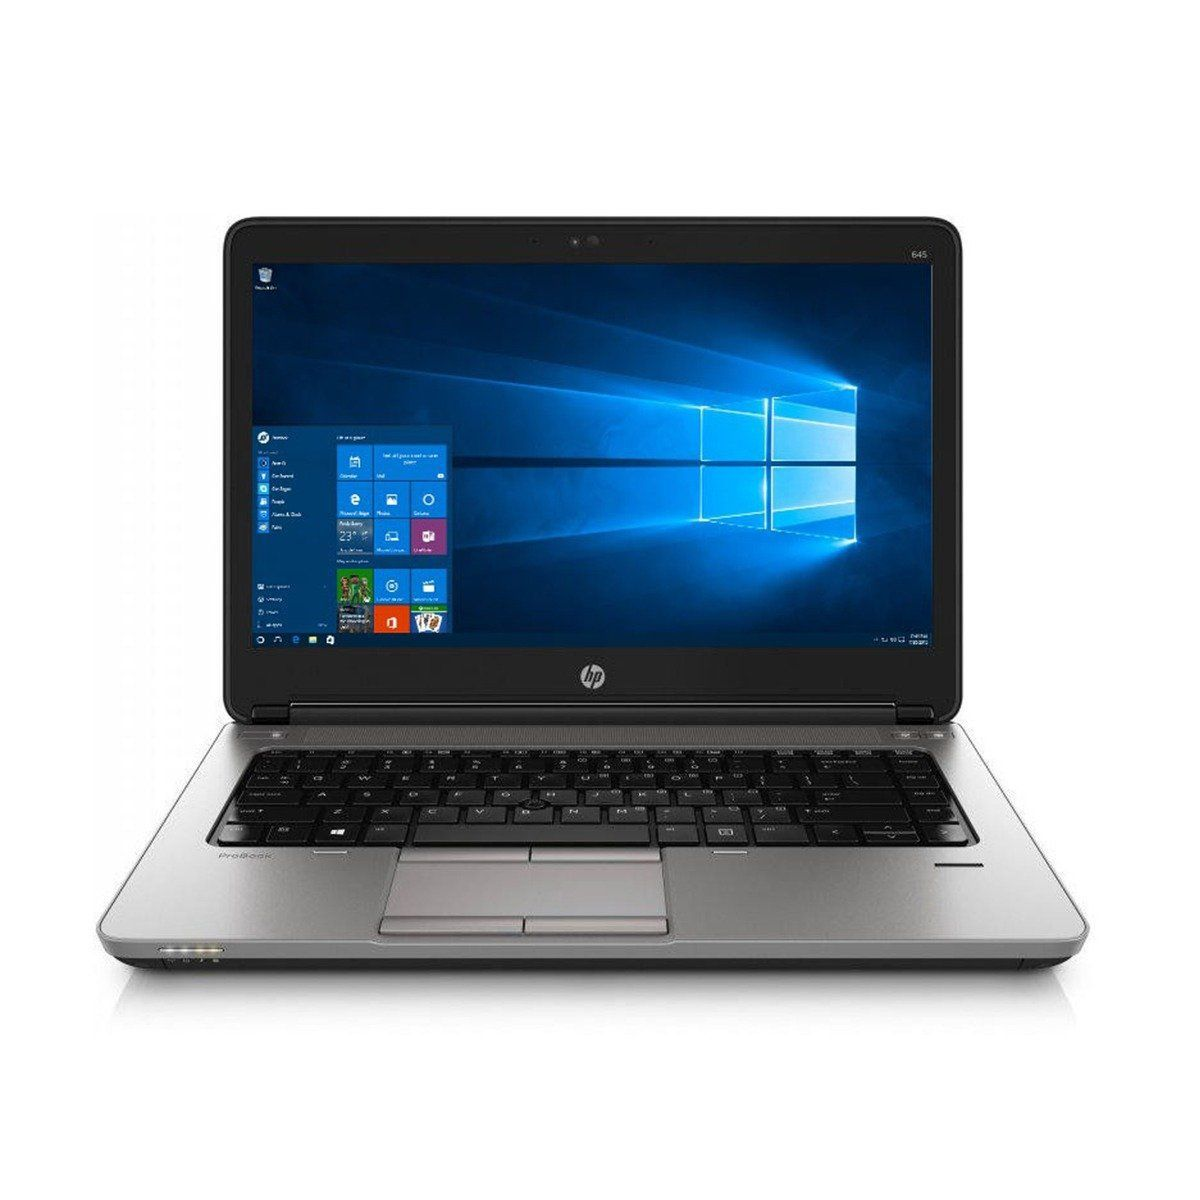 Notebook HP Probook 645 G1 4GB HD 500GB + Win10Pro